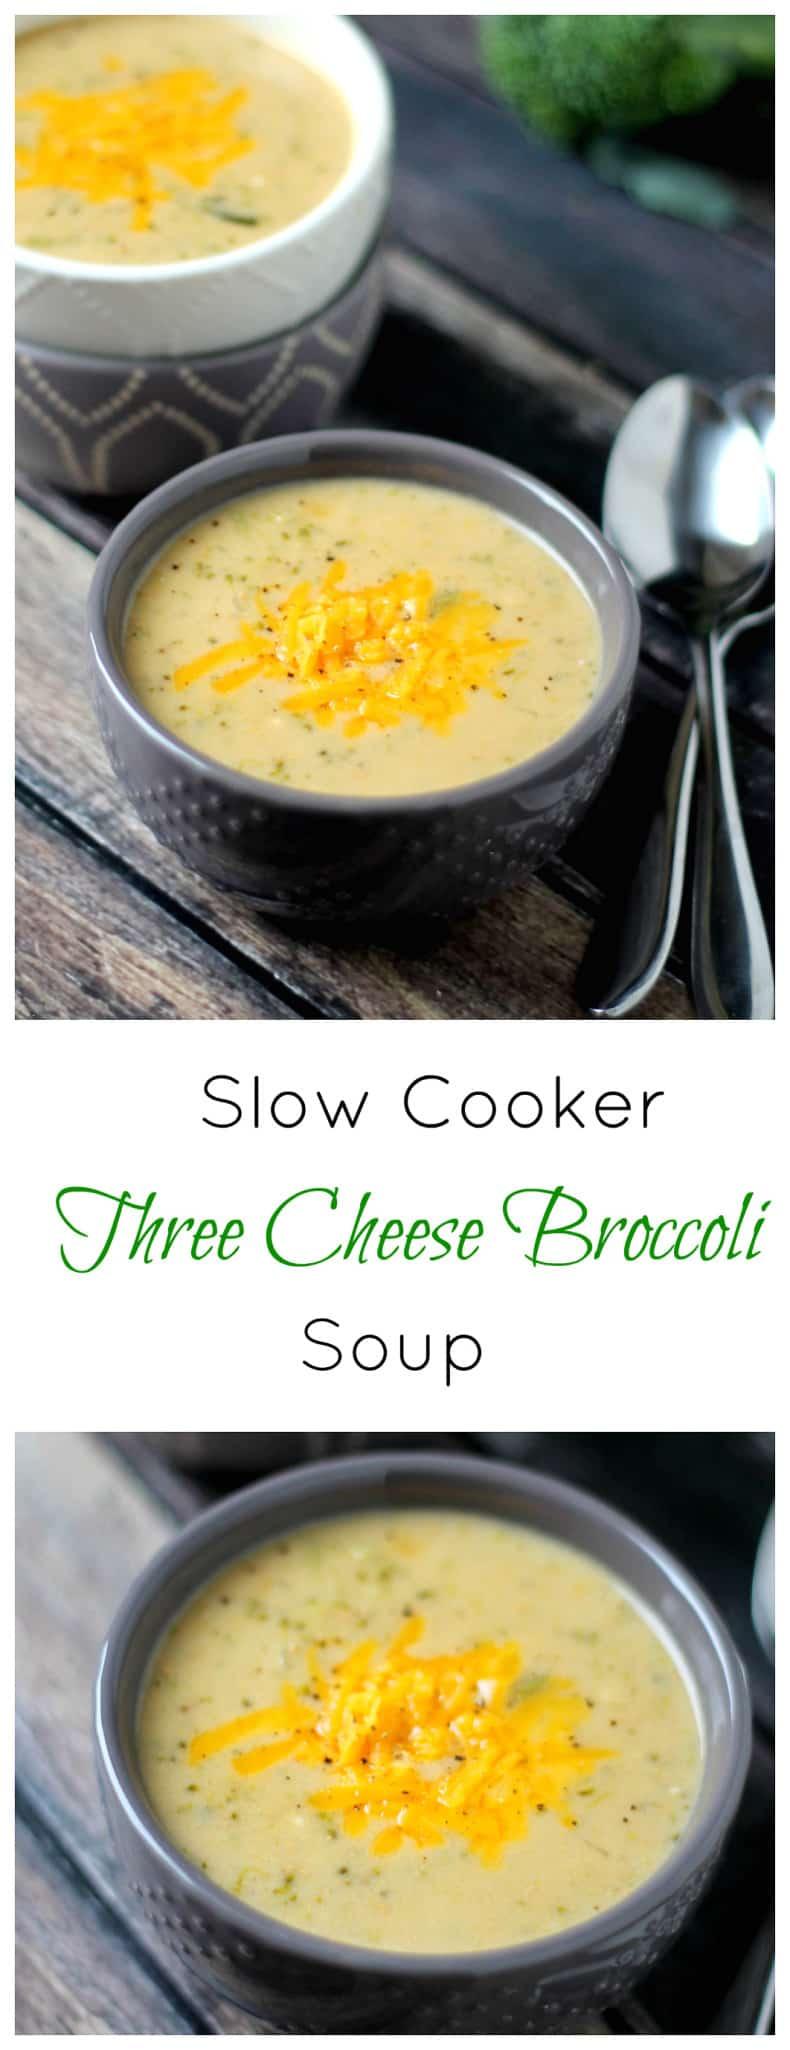 Three Cheese Broccoli Soup Slow Cooker recipe